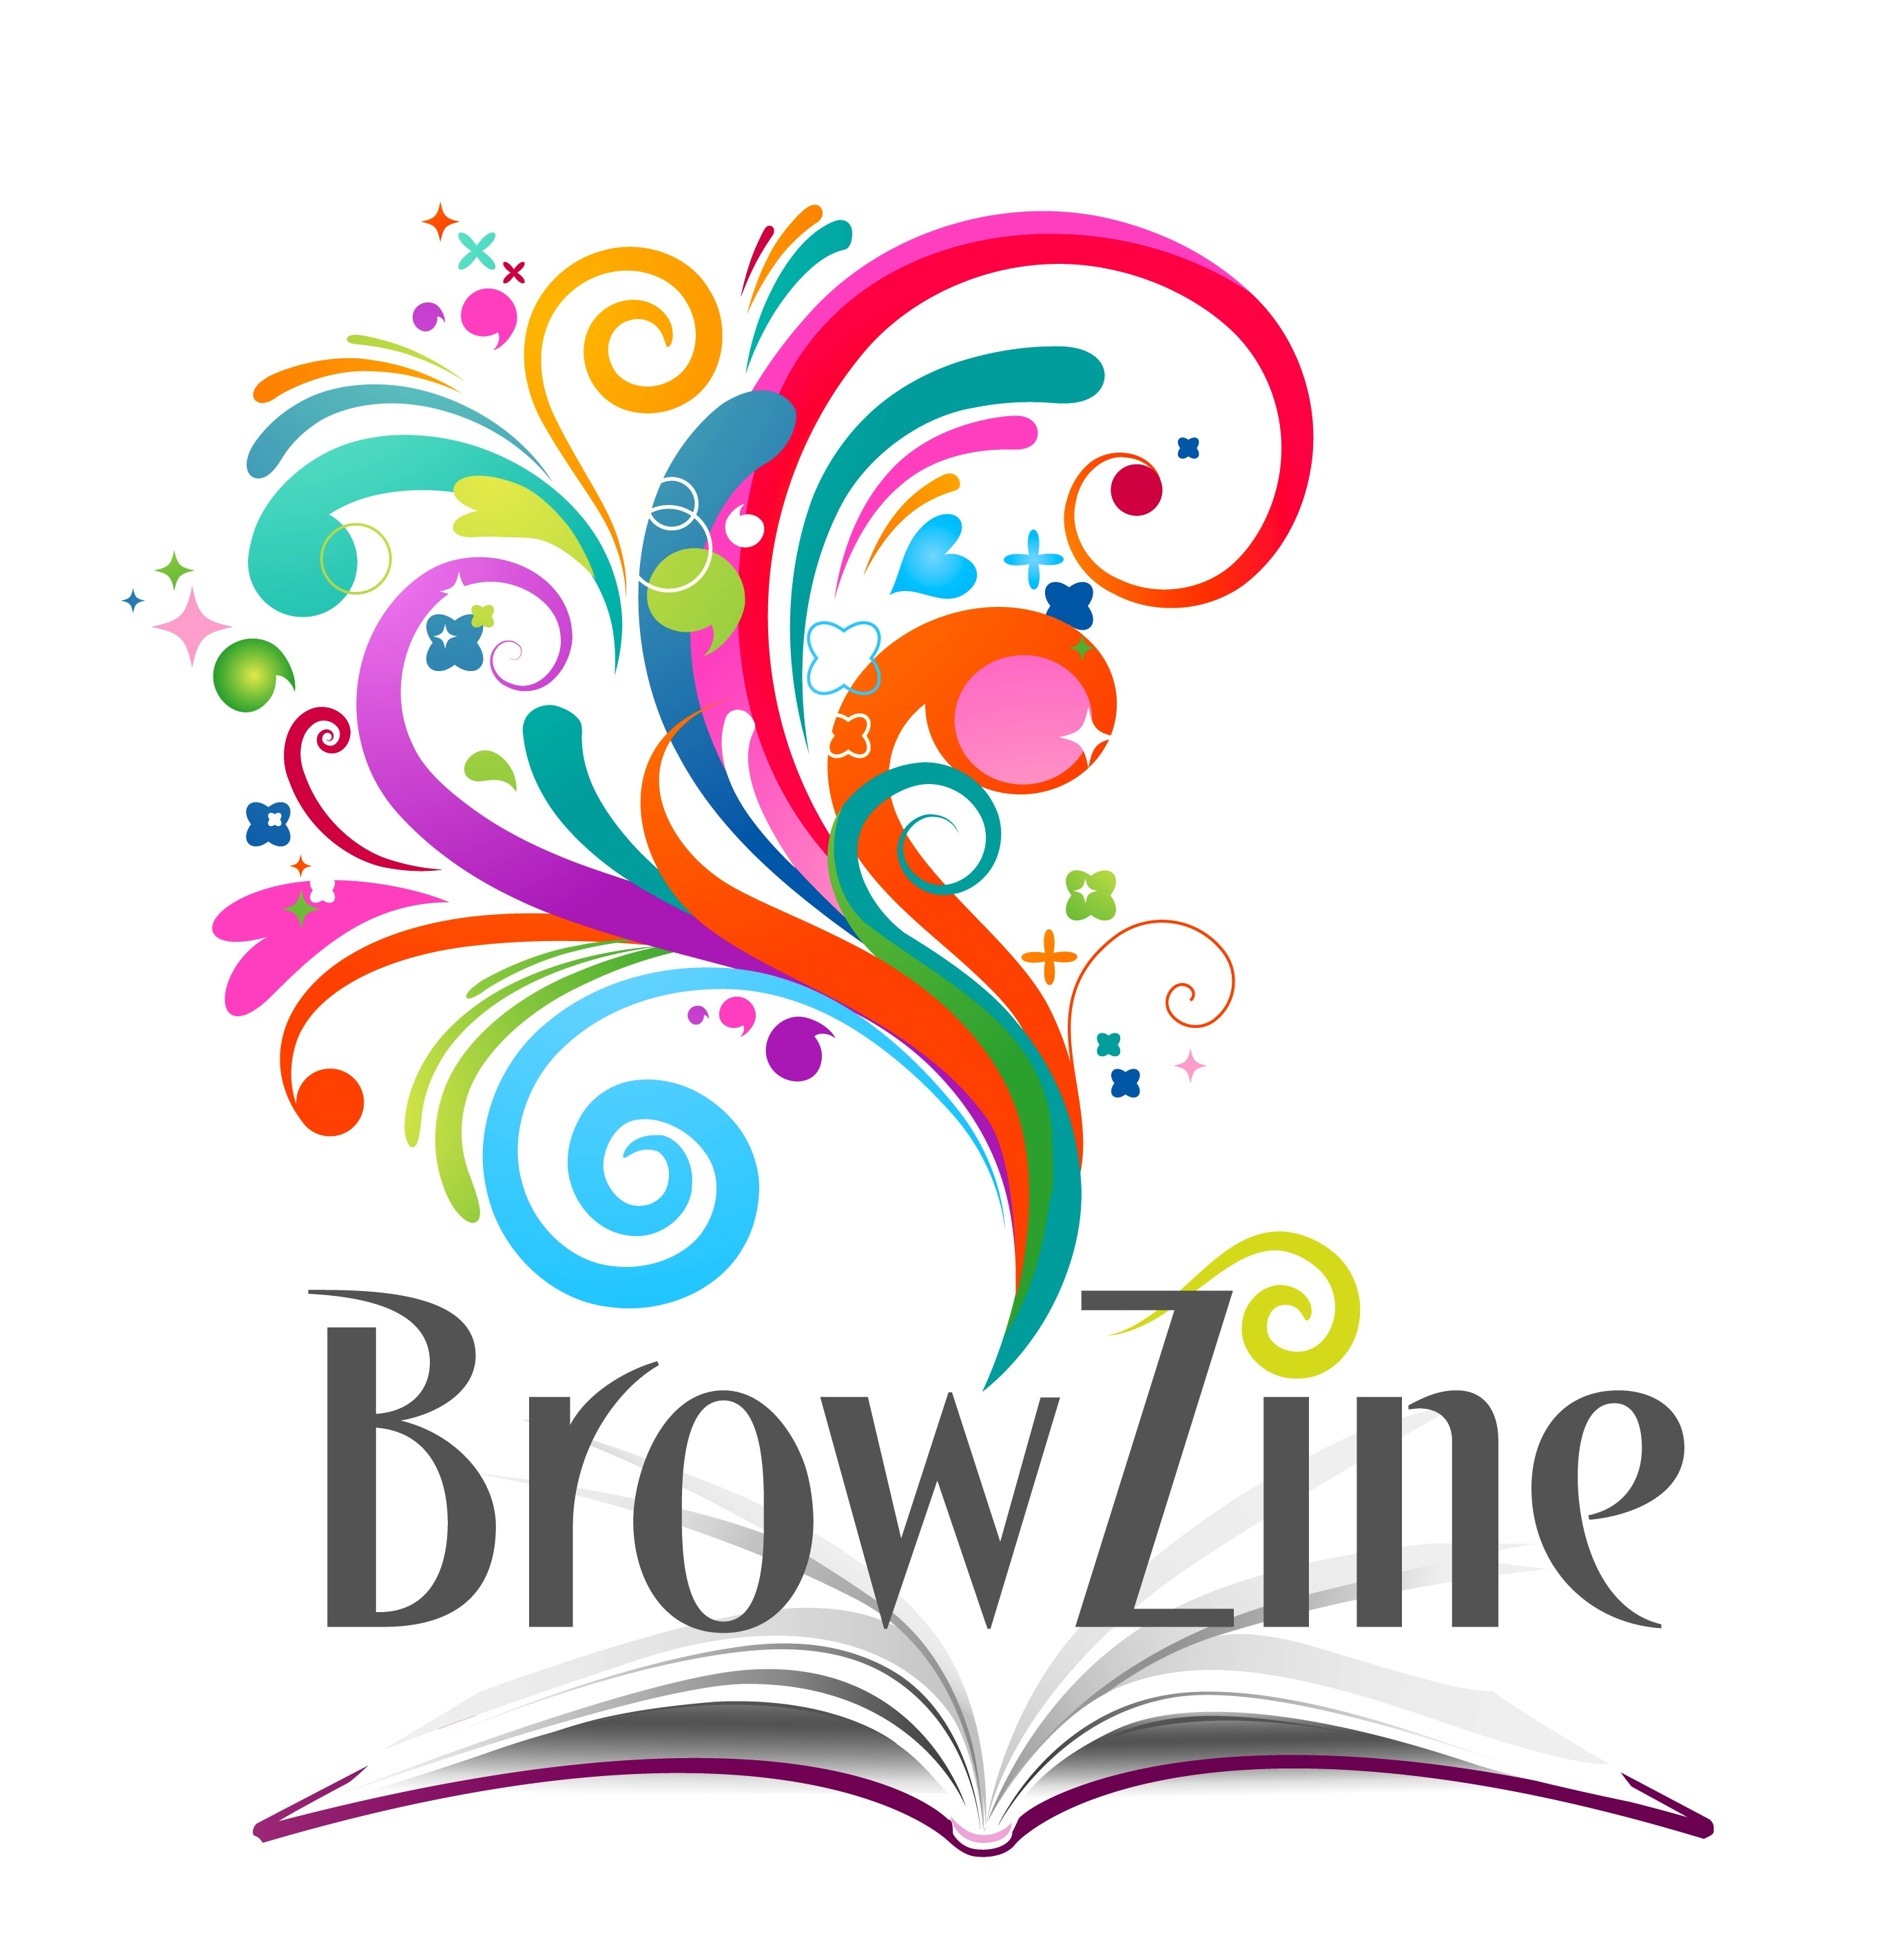 Browzine logog